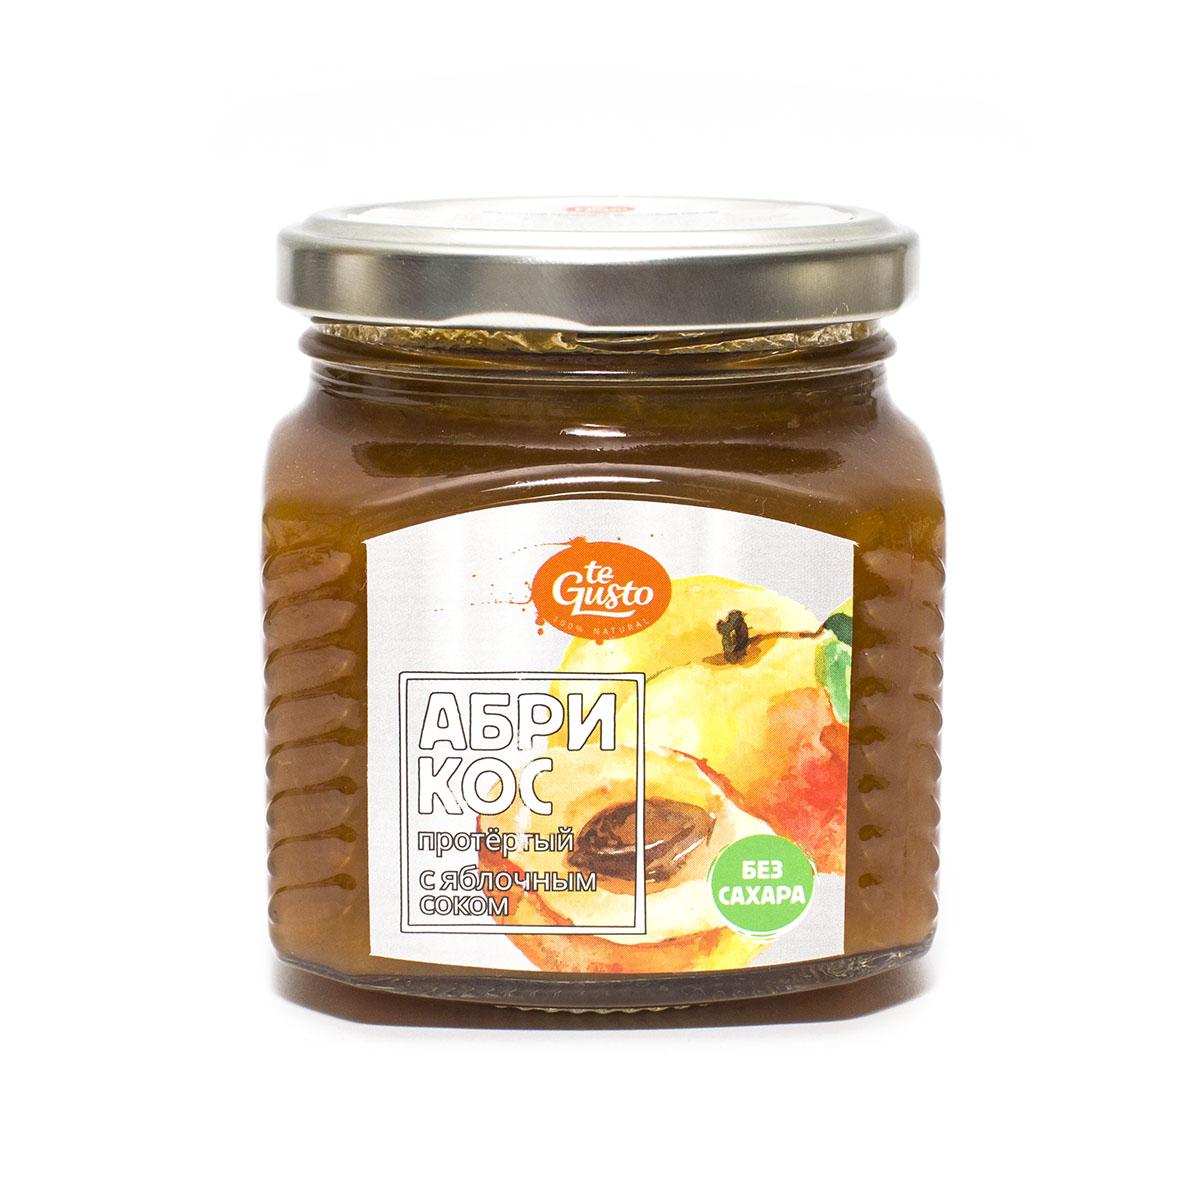 Абрикос протертый с яблочным соком Te-Gusto, 300 г te gusto миндаль и инжир в меду 300 г